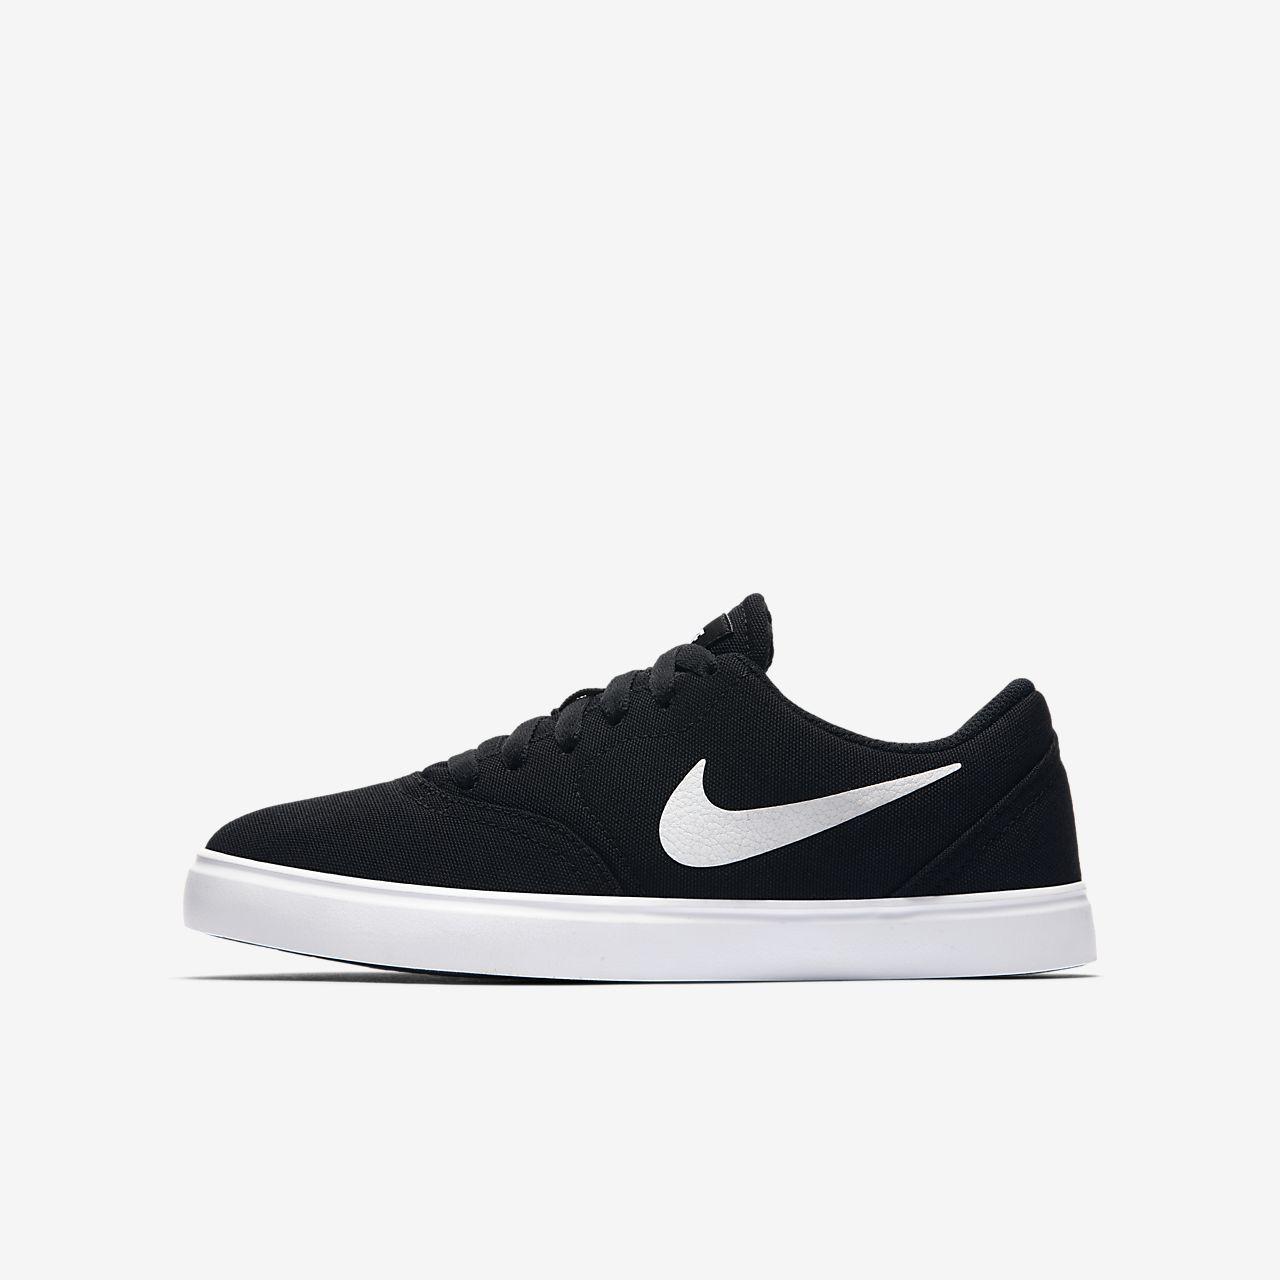 Skateboardsko Nike SB Check Canvas för ungdomar